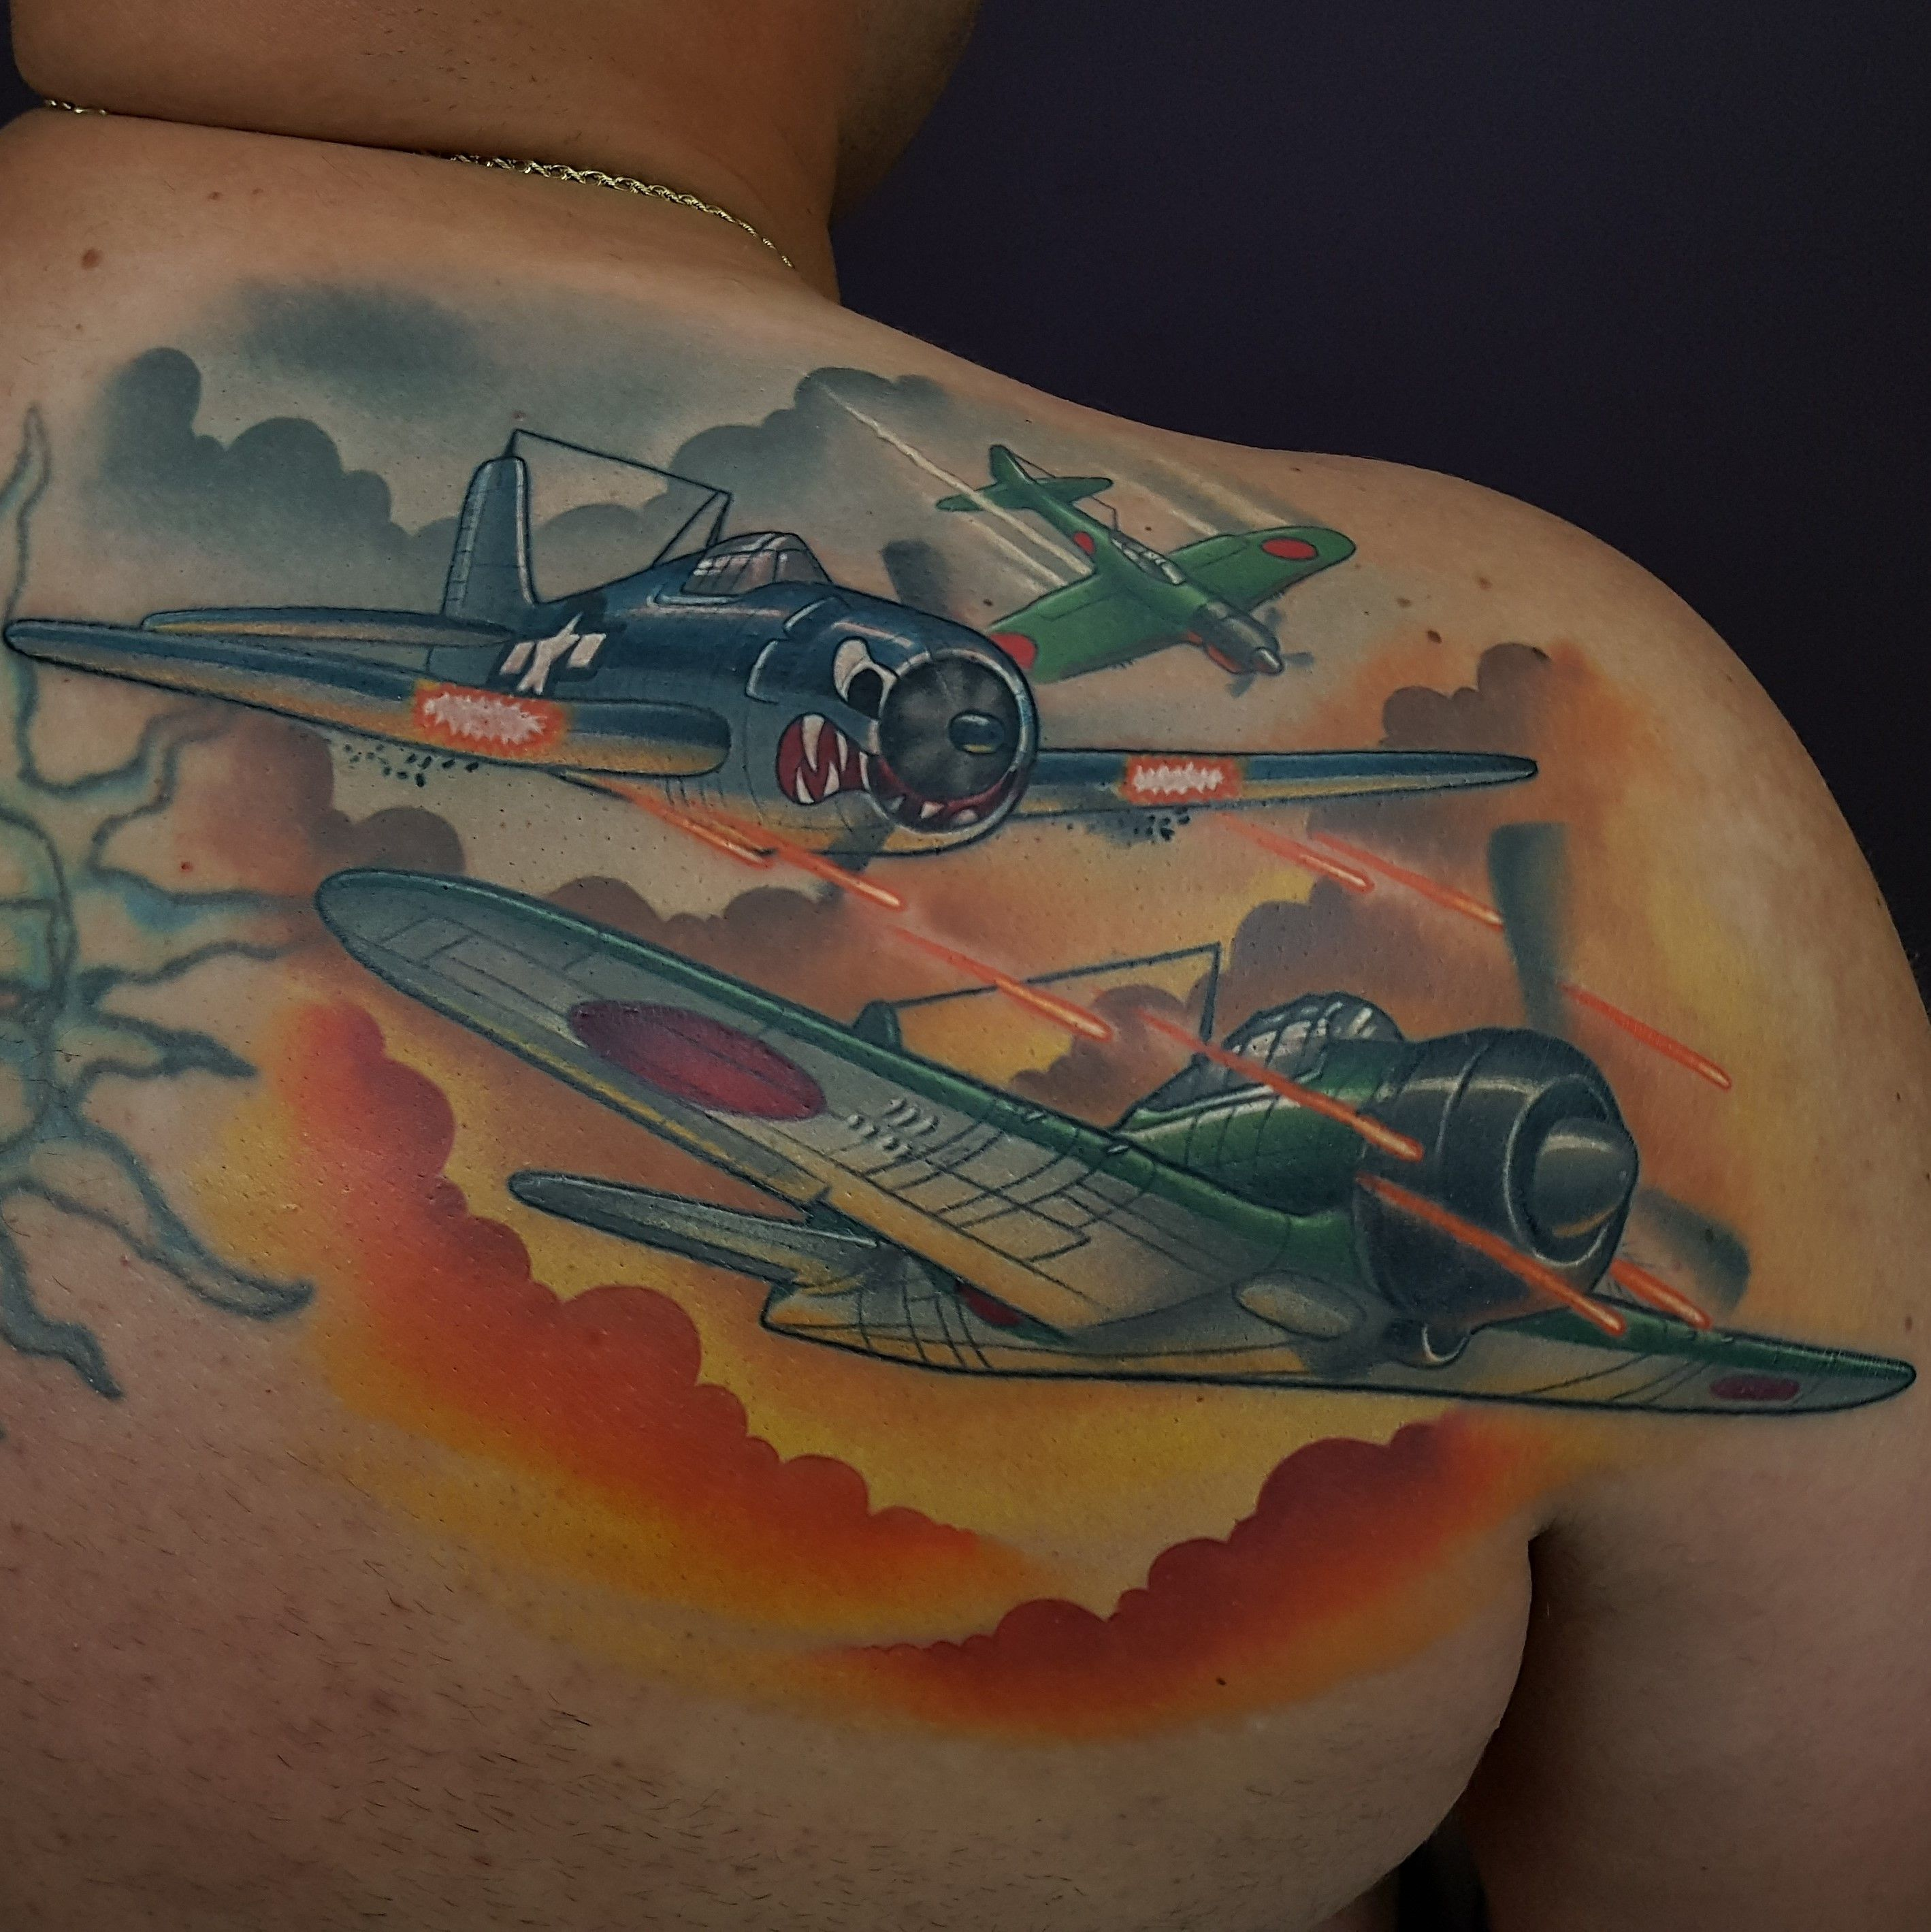 Fighter jet tattoo by cracker joe swider in ct tattoos